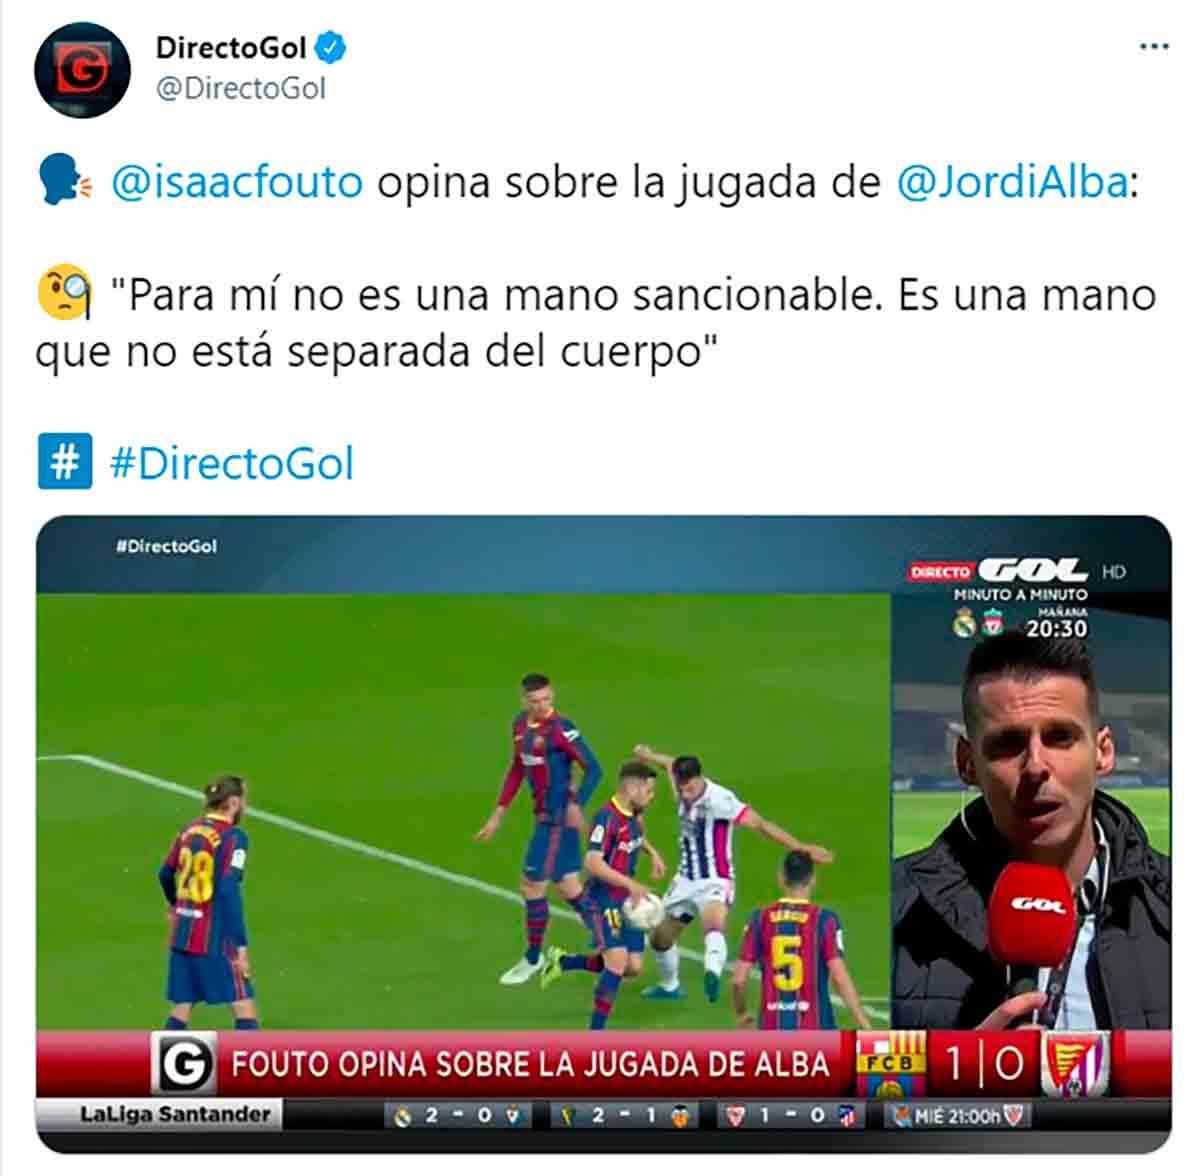 Isaac Fouto penalti Jordi Alba Valladolid